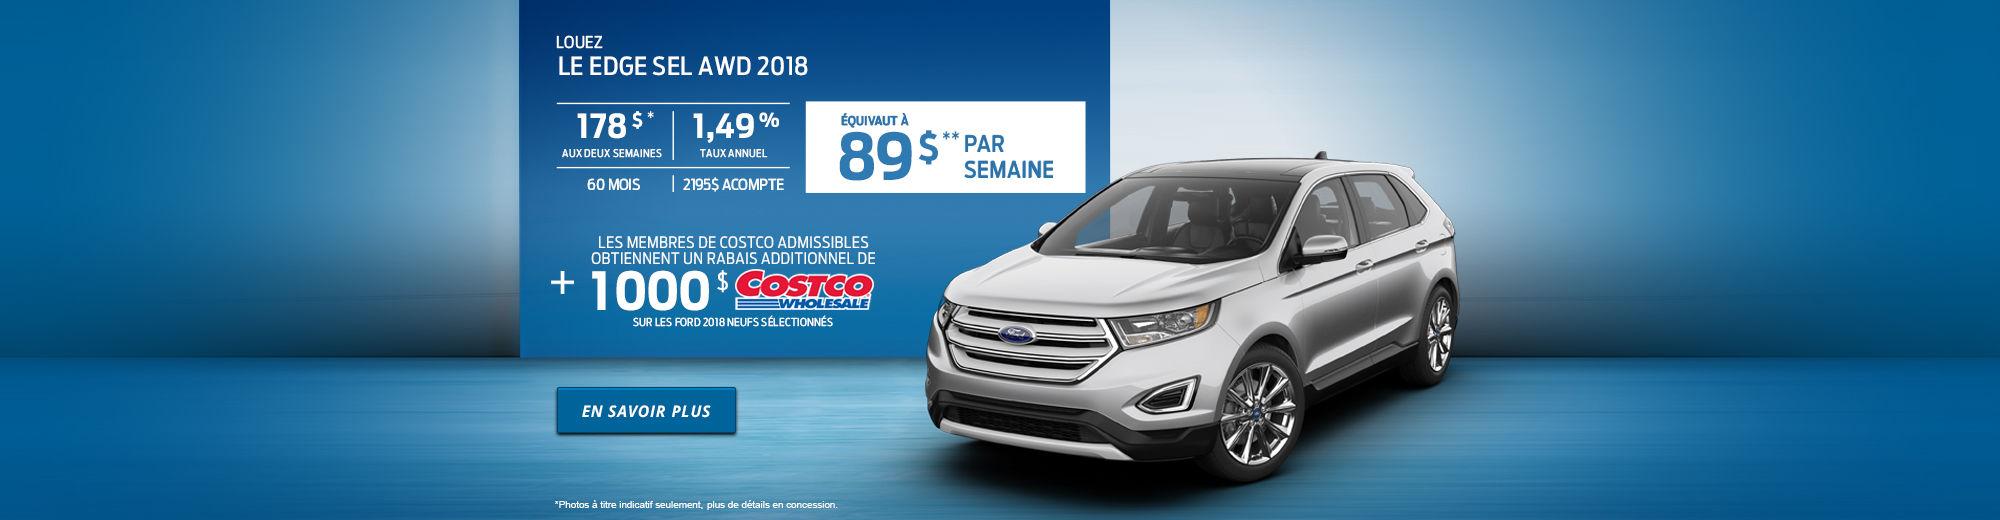 Ford Edge SEL AWD 2018